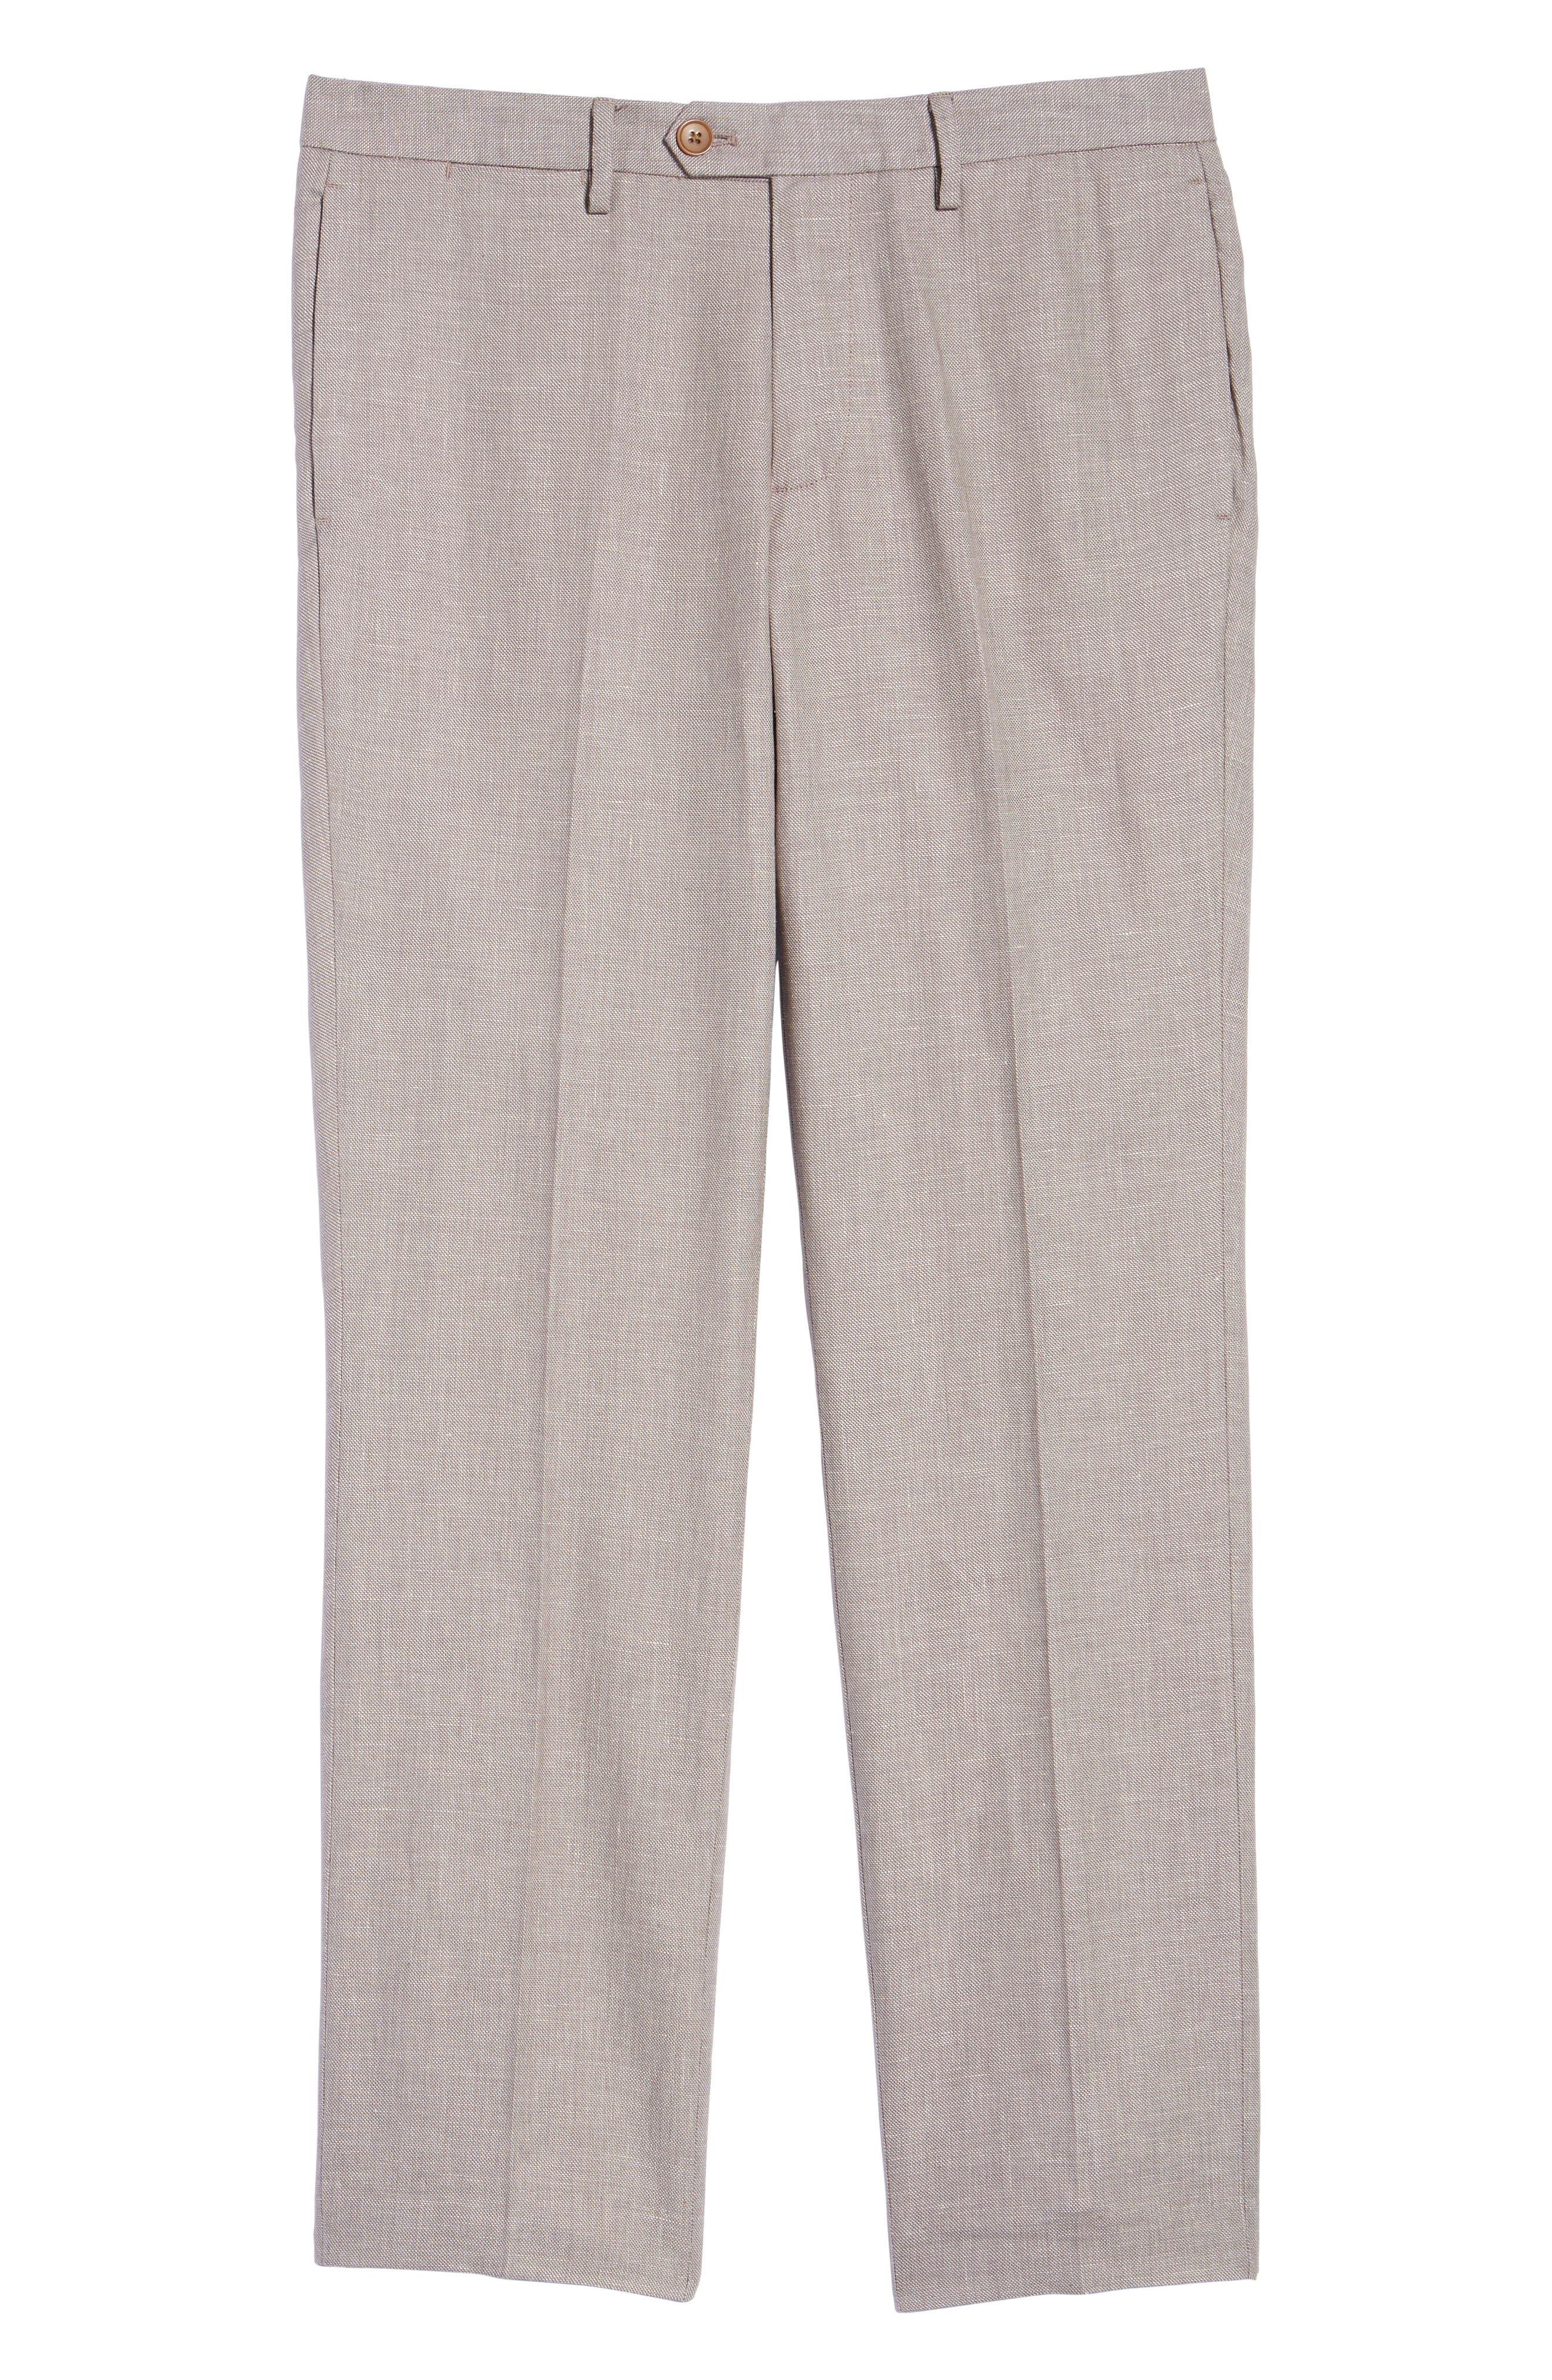 Flat Front Solid Stretch Cotton & Linen Pants,                             Alternate thumbnail 12, color,